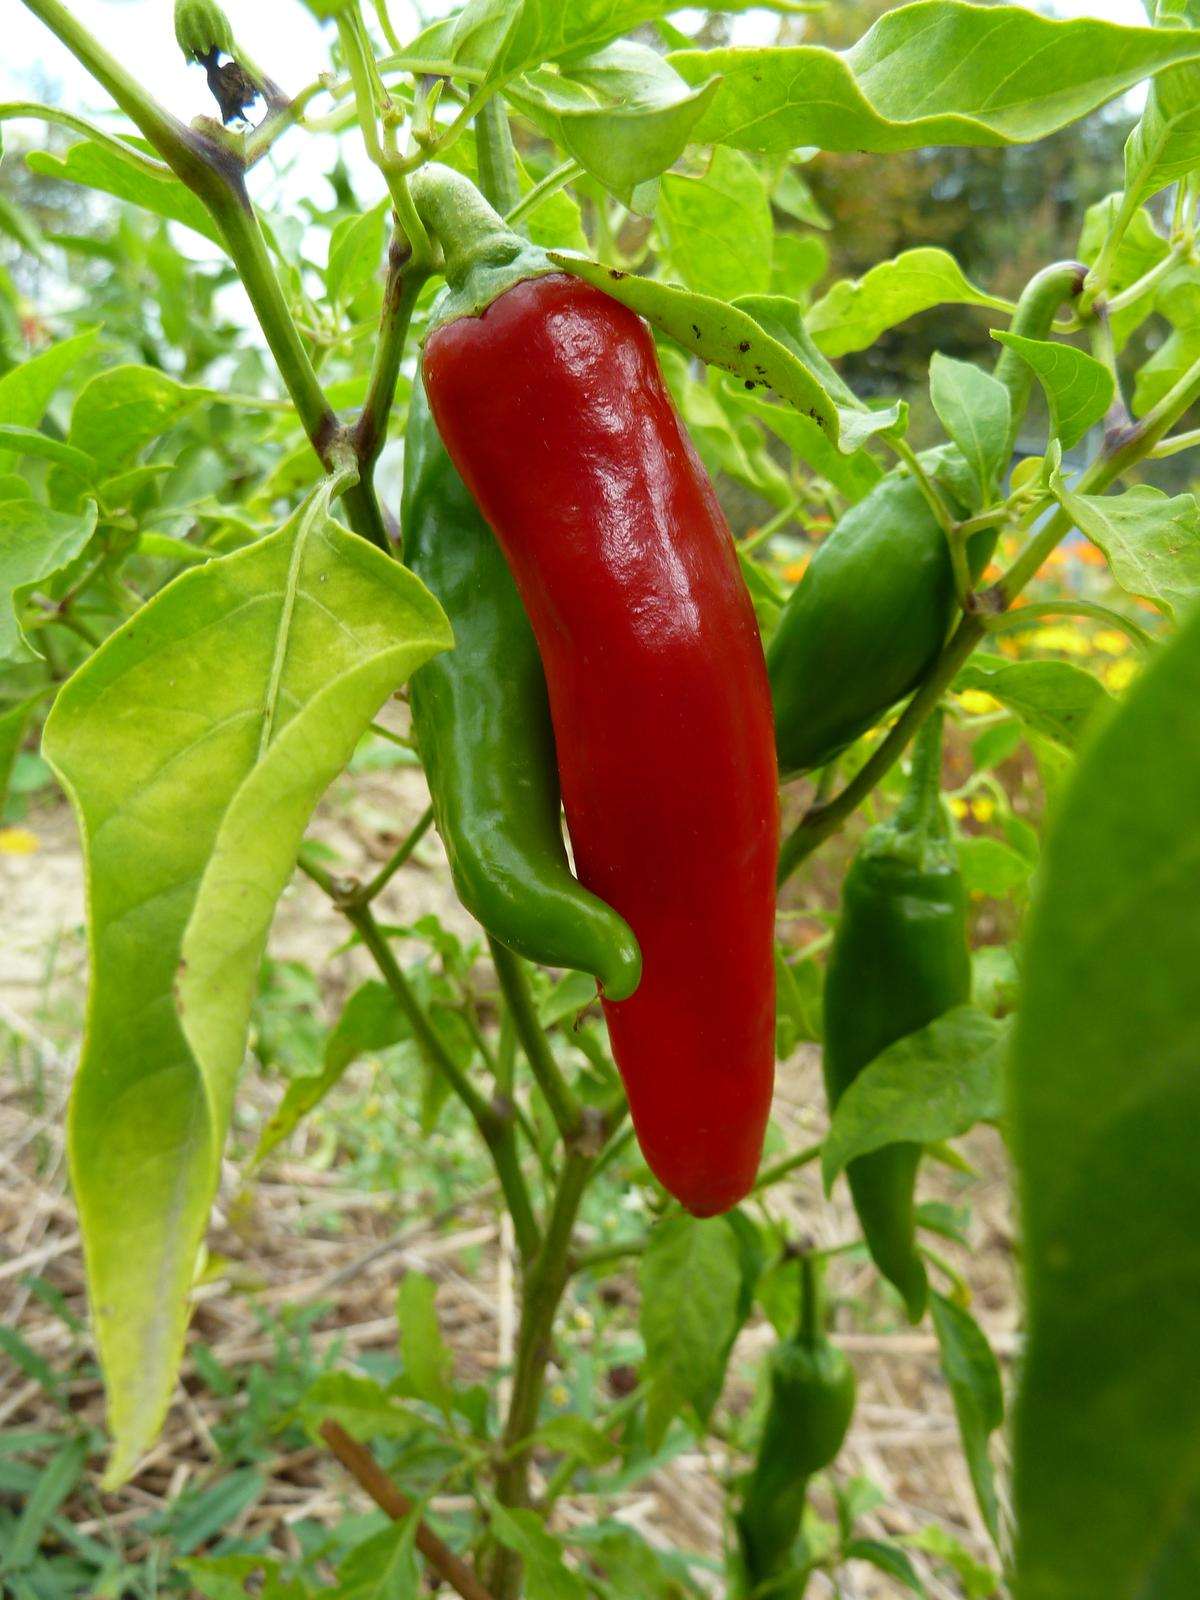 Paprika koreninová, sladká Kalocsai - 30 ks semená - Obrázok č. 1